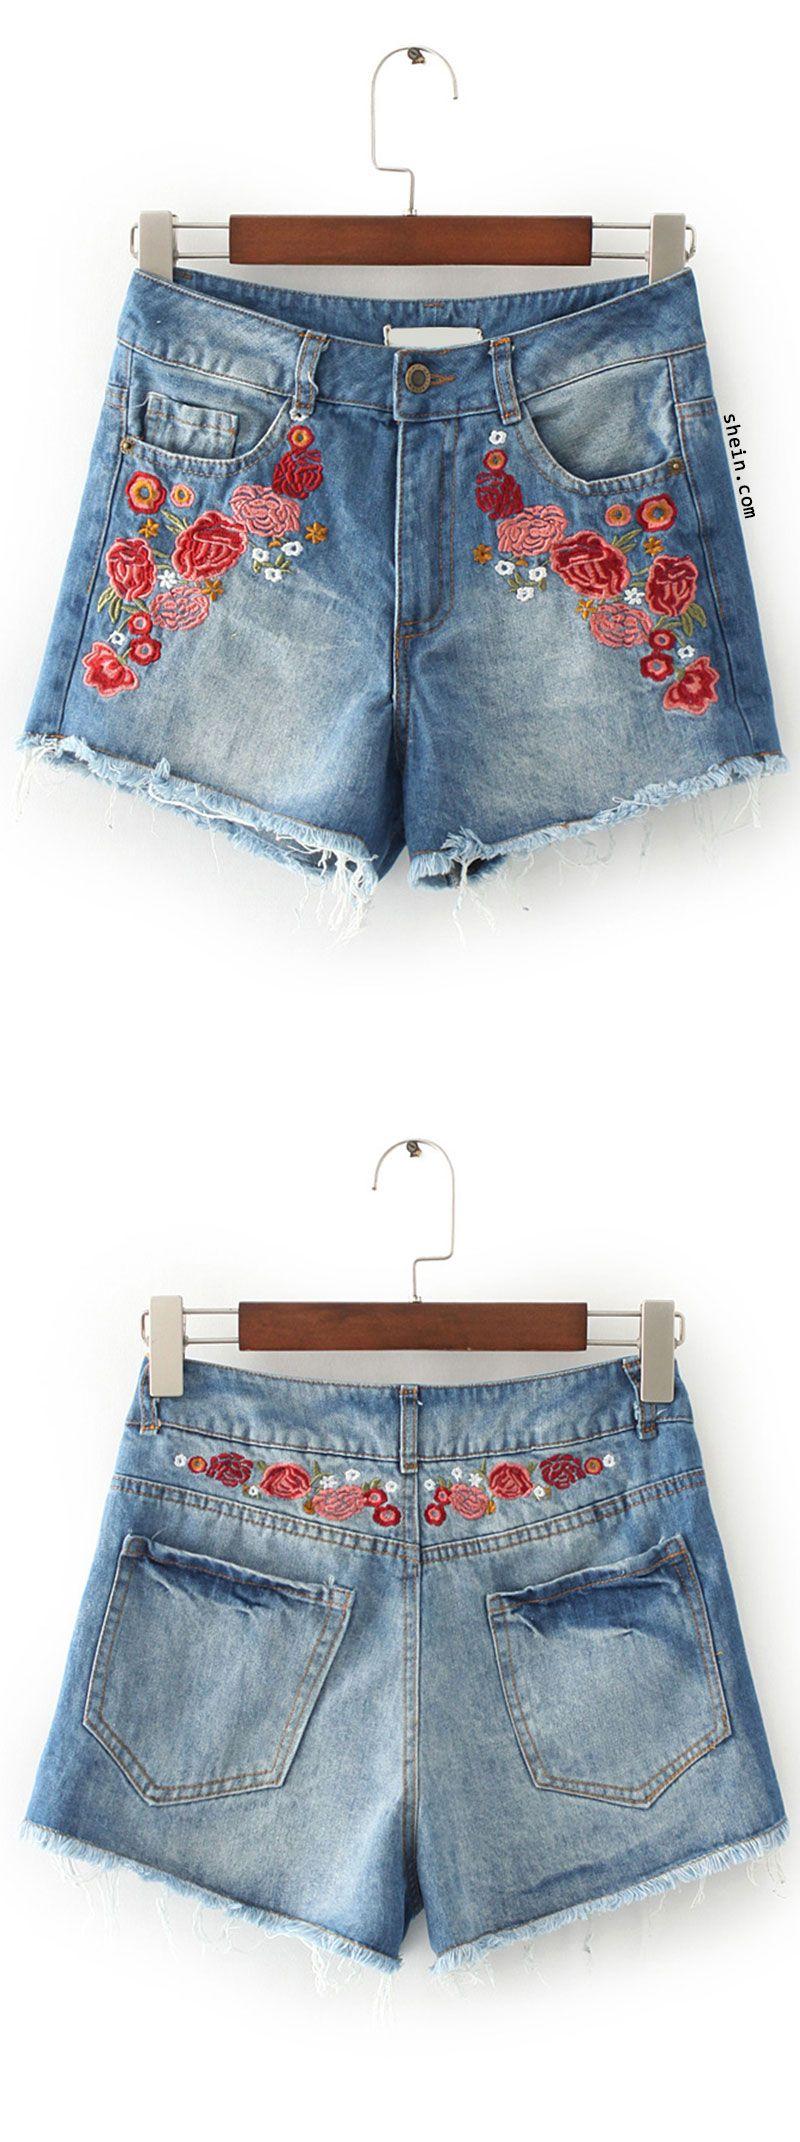 Blue flower embroidery raw hem denim shorts denim